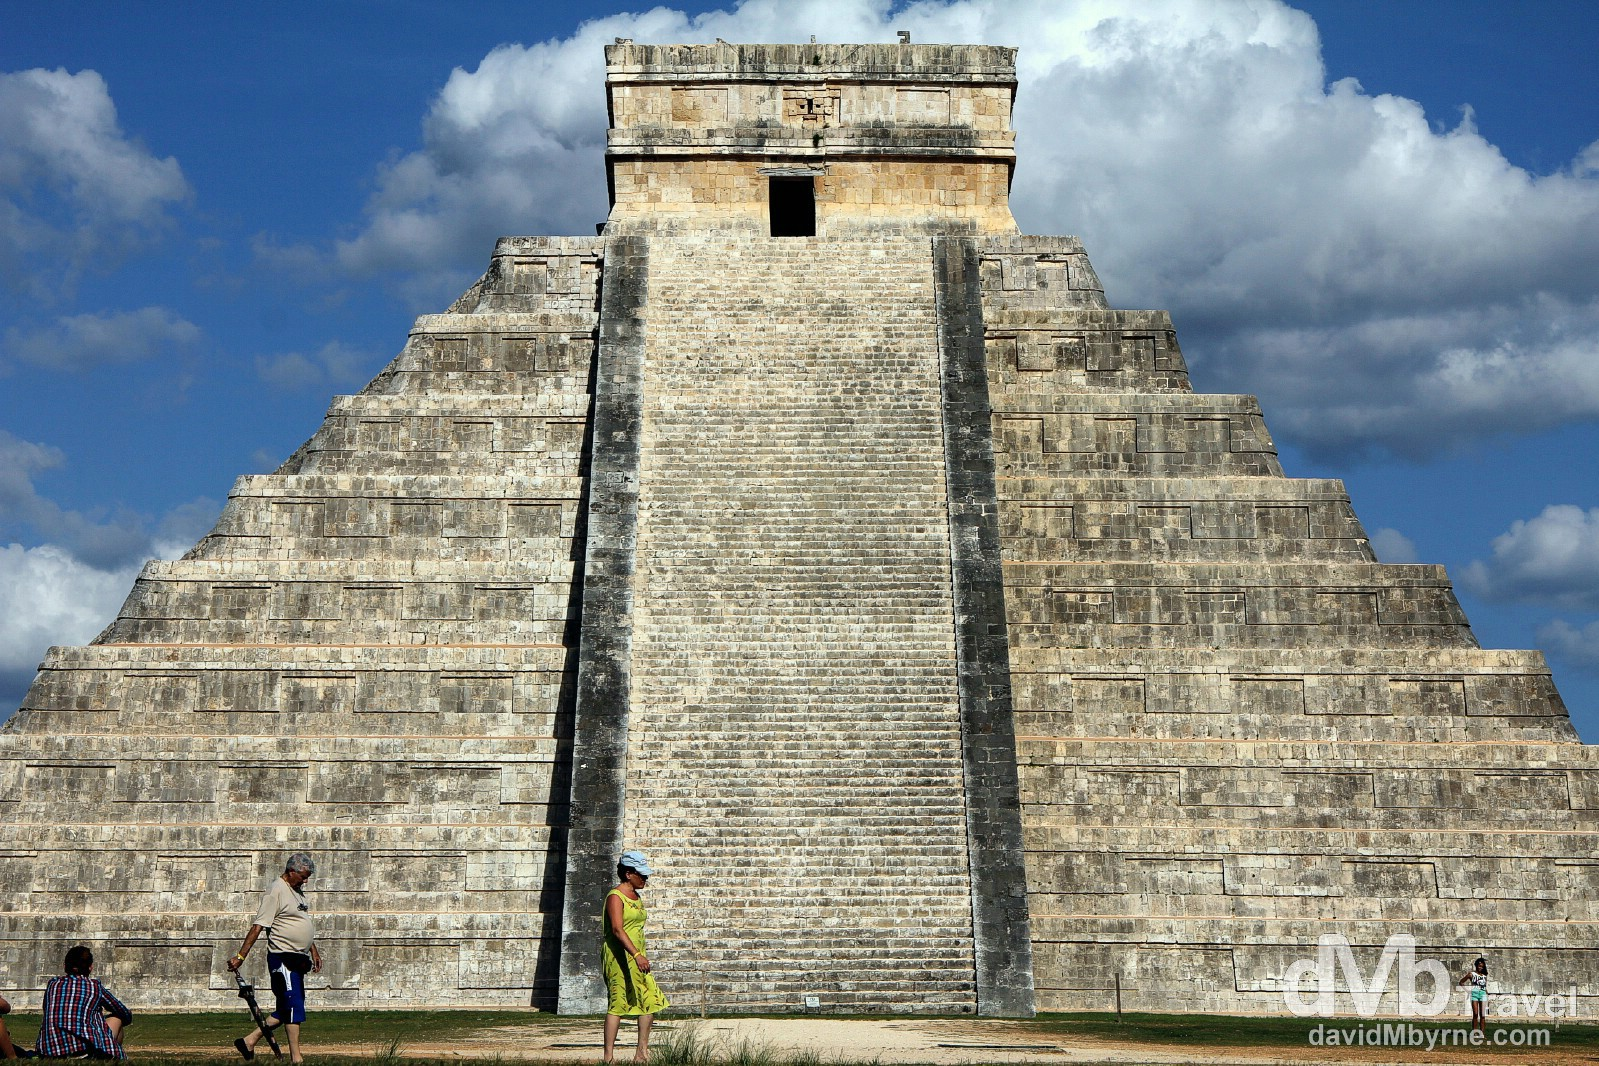 El Castillo / Pyramid of Kukulcan, Chichén Itzá, Yucatán Peninsula, Mexico. May 3rd 2013.